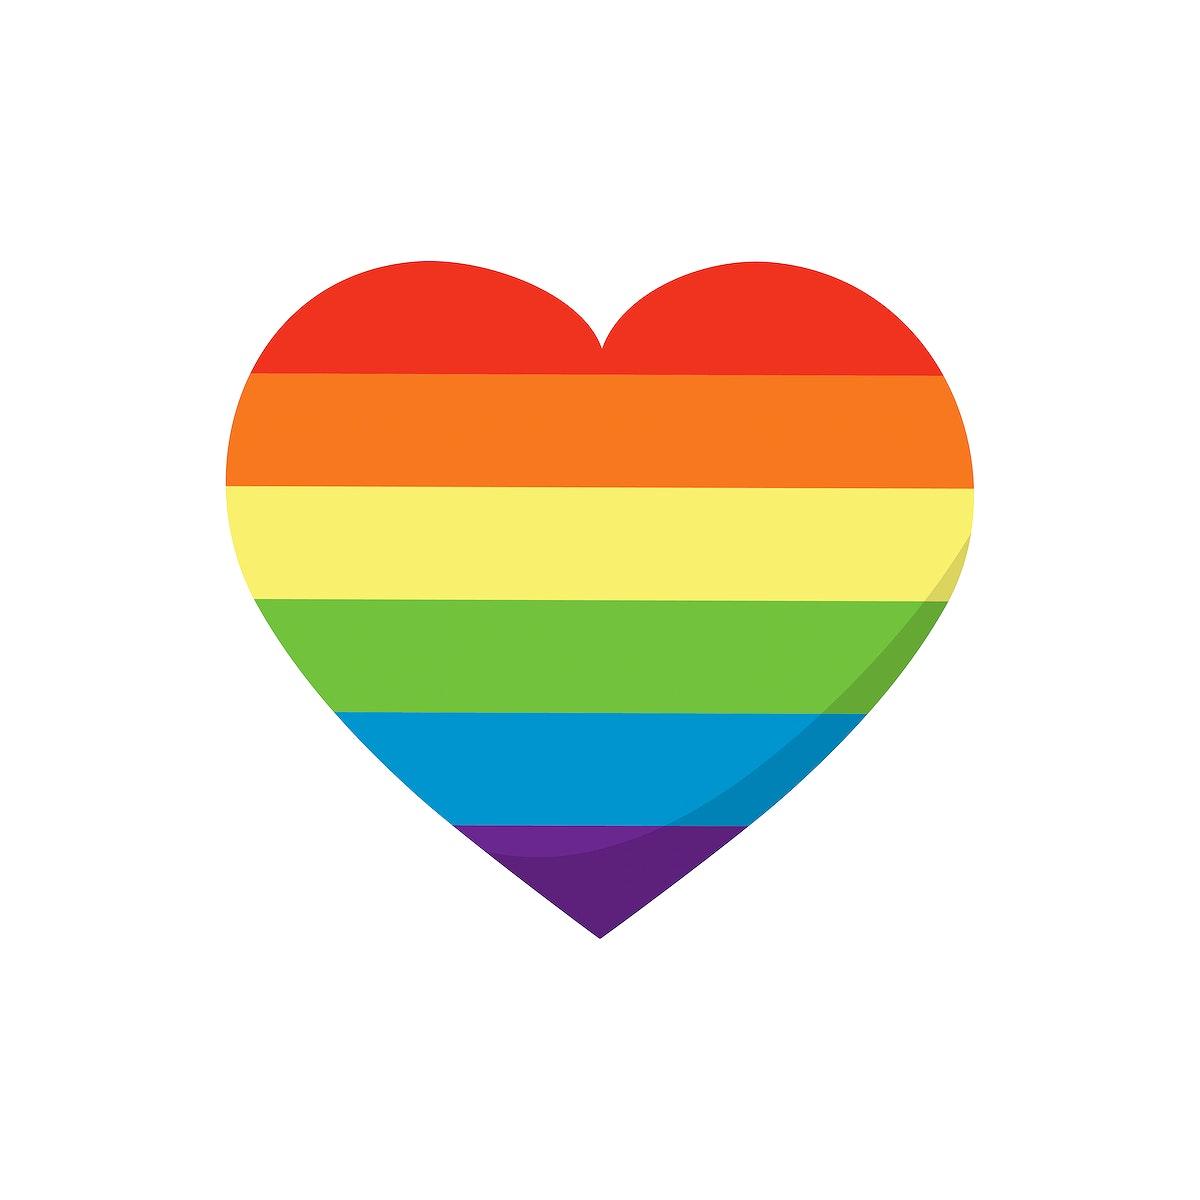 LGBT symbol in heart shape graphic illustration